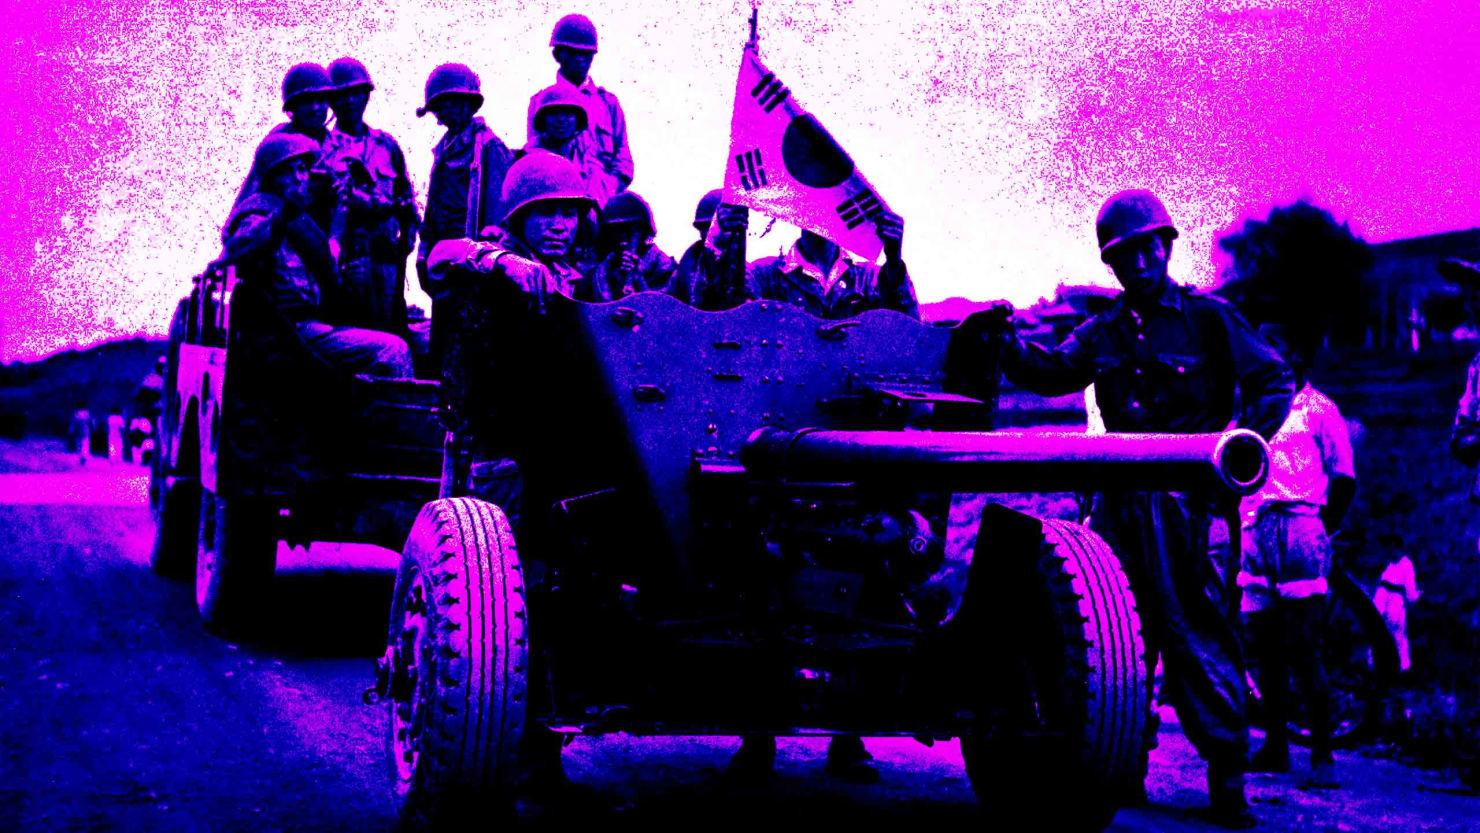 The Quagmire to End All Quagmires: the Korean War